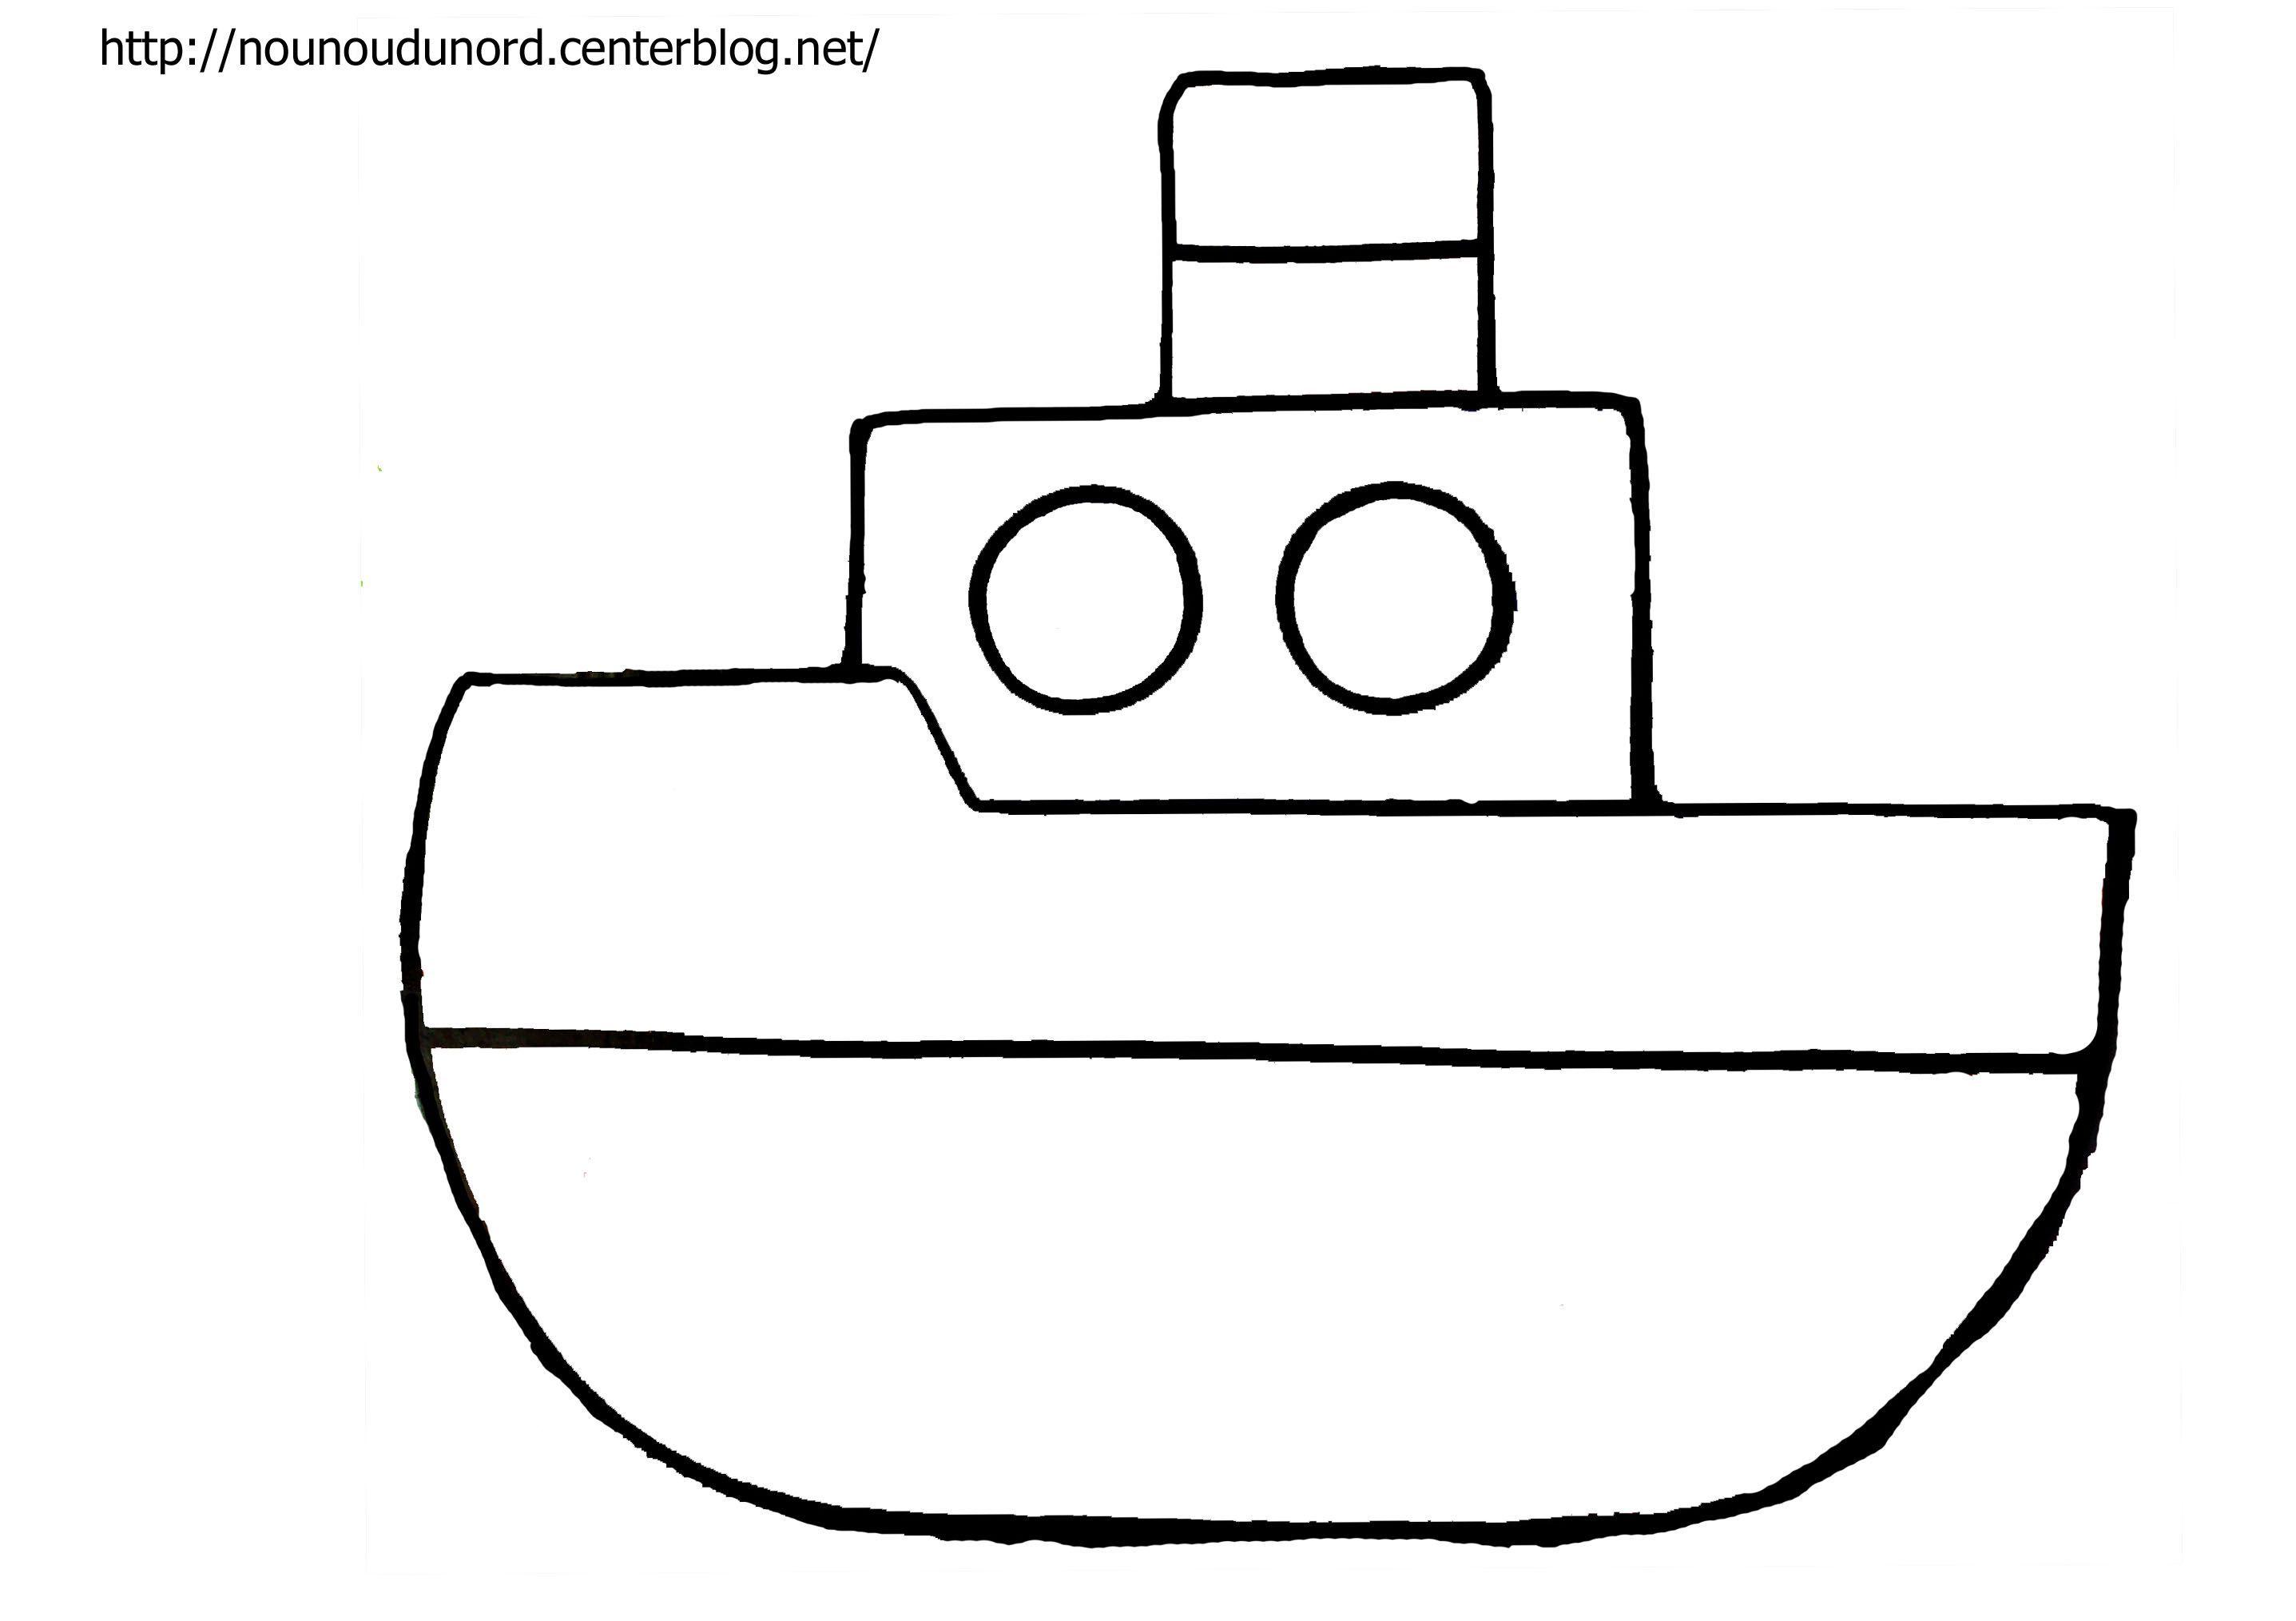 Coloriage bateau dessin par nounoudunord - Coloriage bateau ...